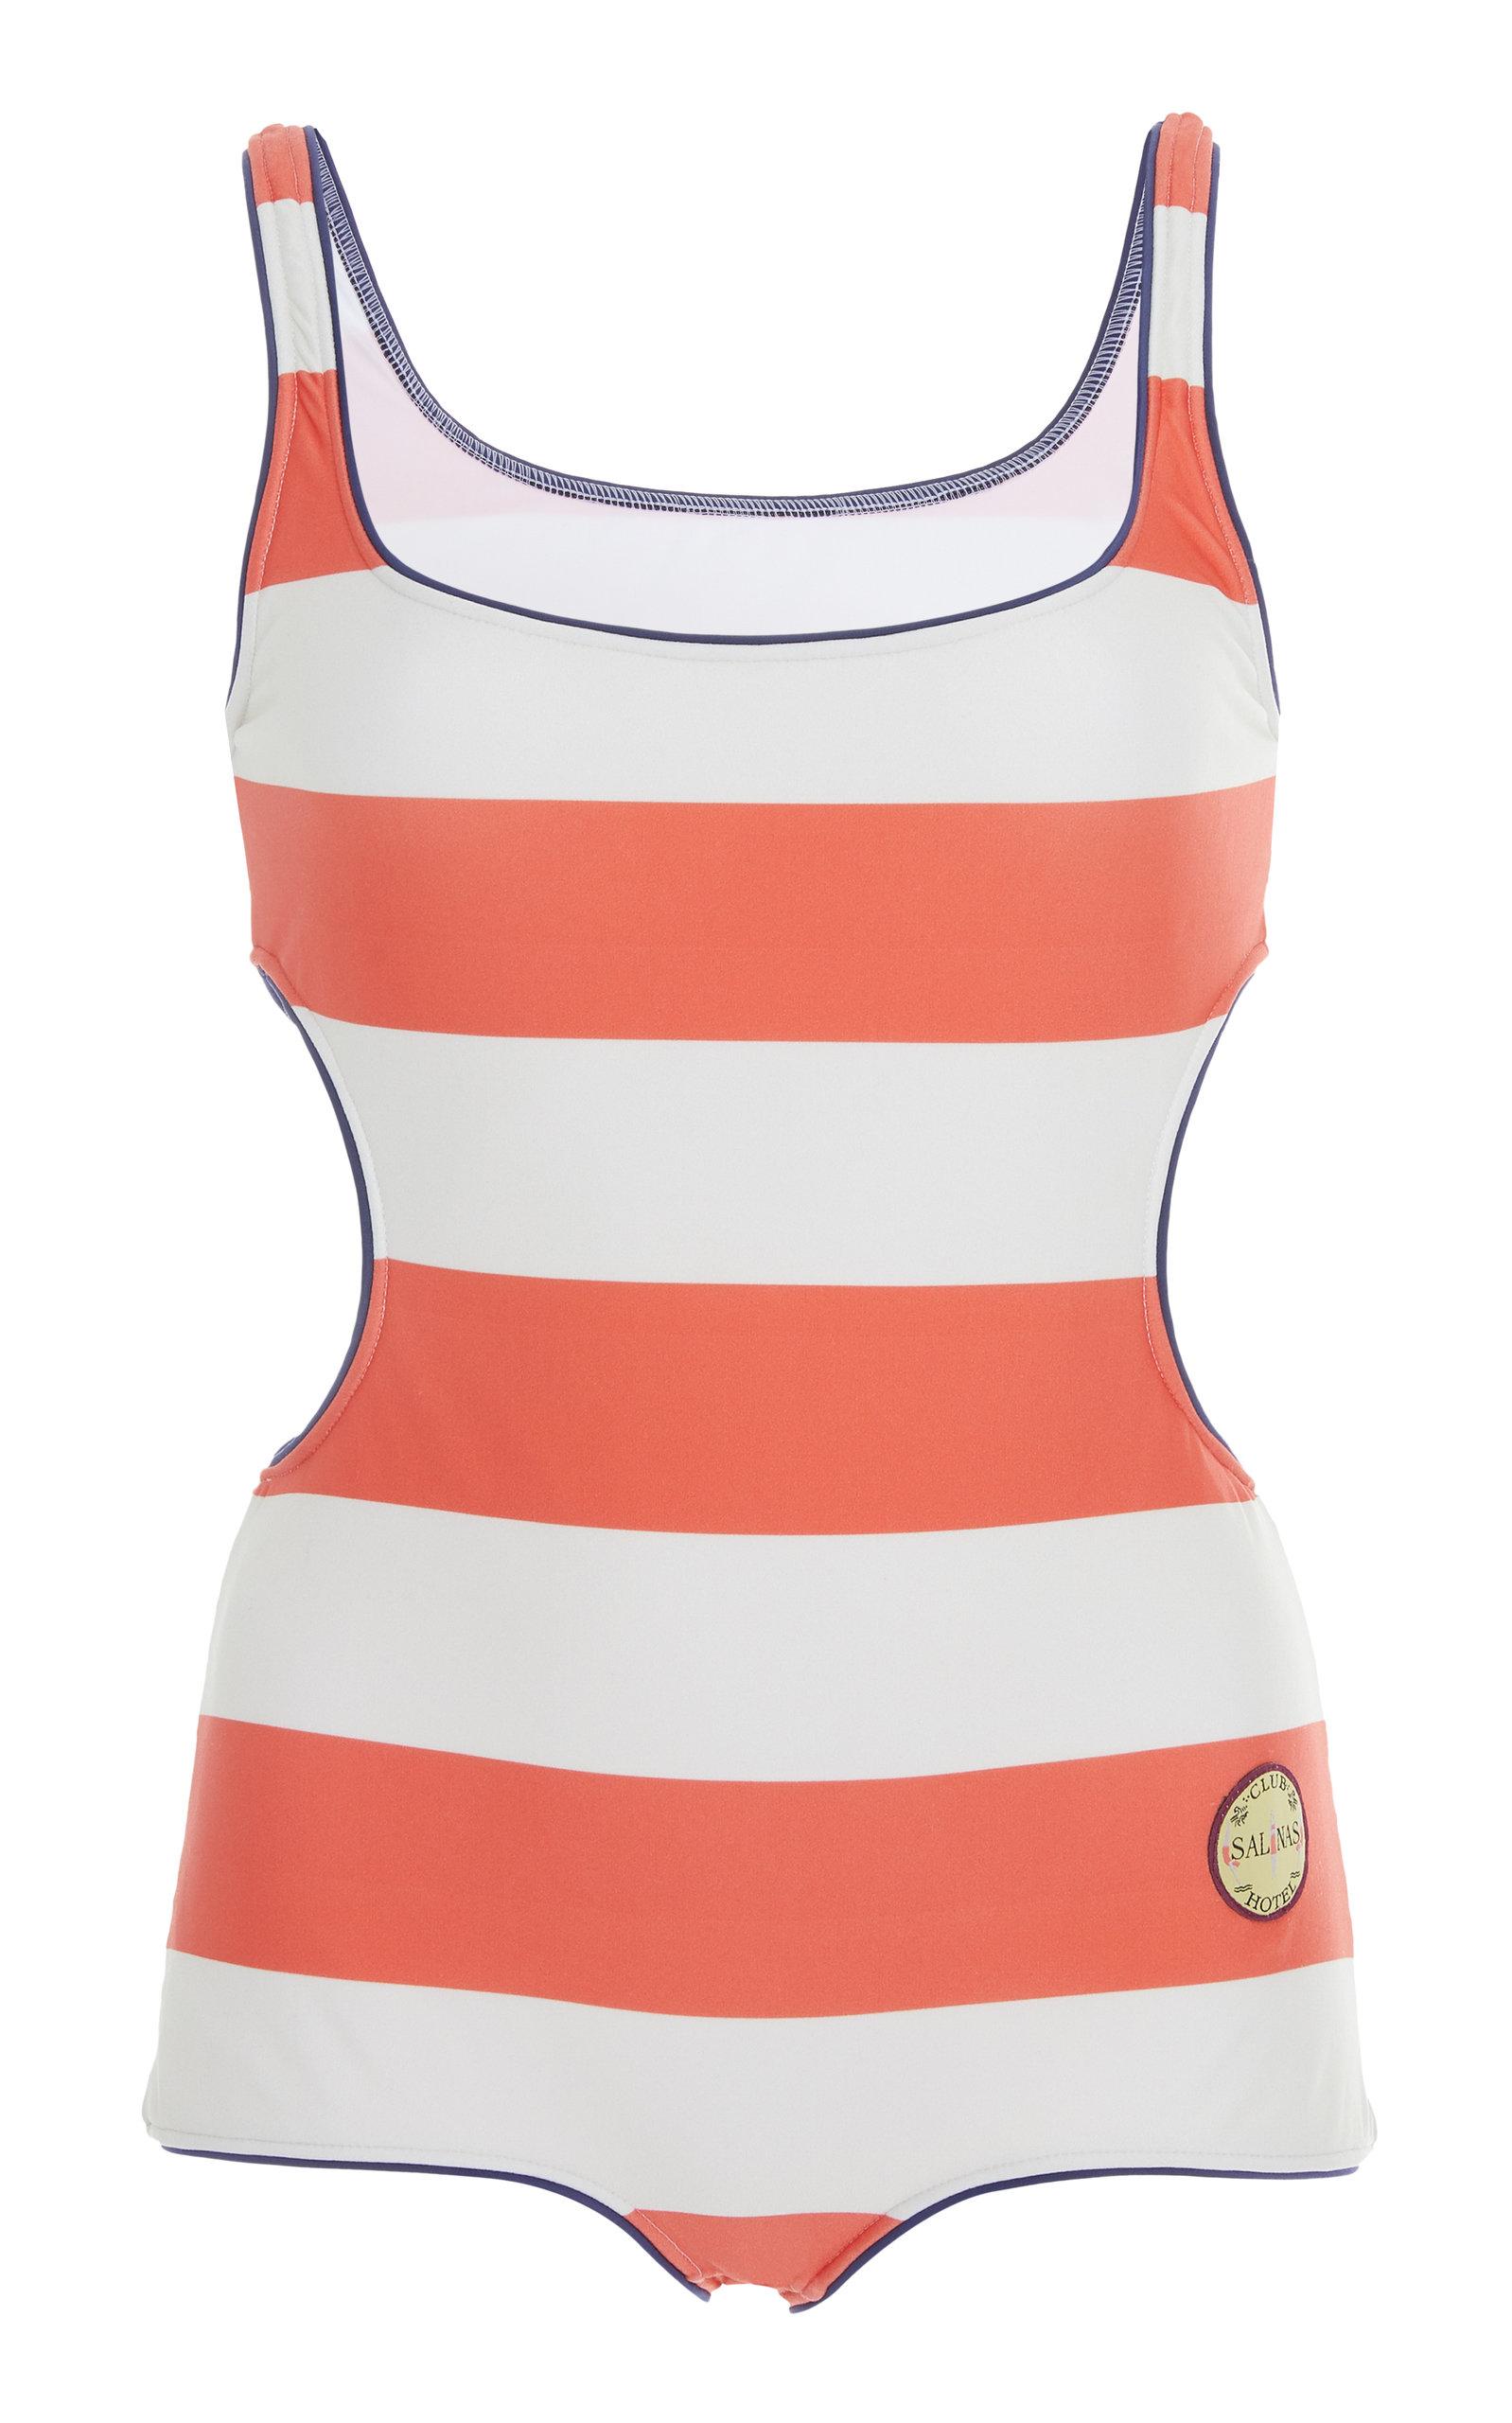 SALINAS Retro Speed One-Piece Swimsuit in Stripe